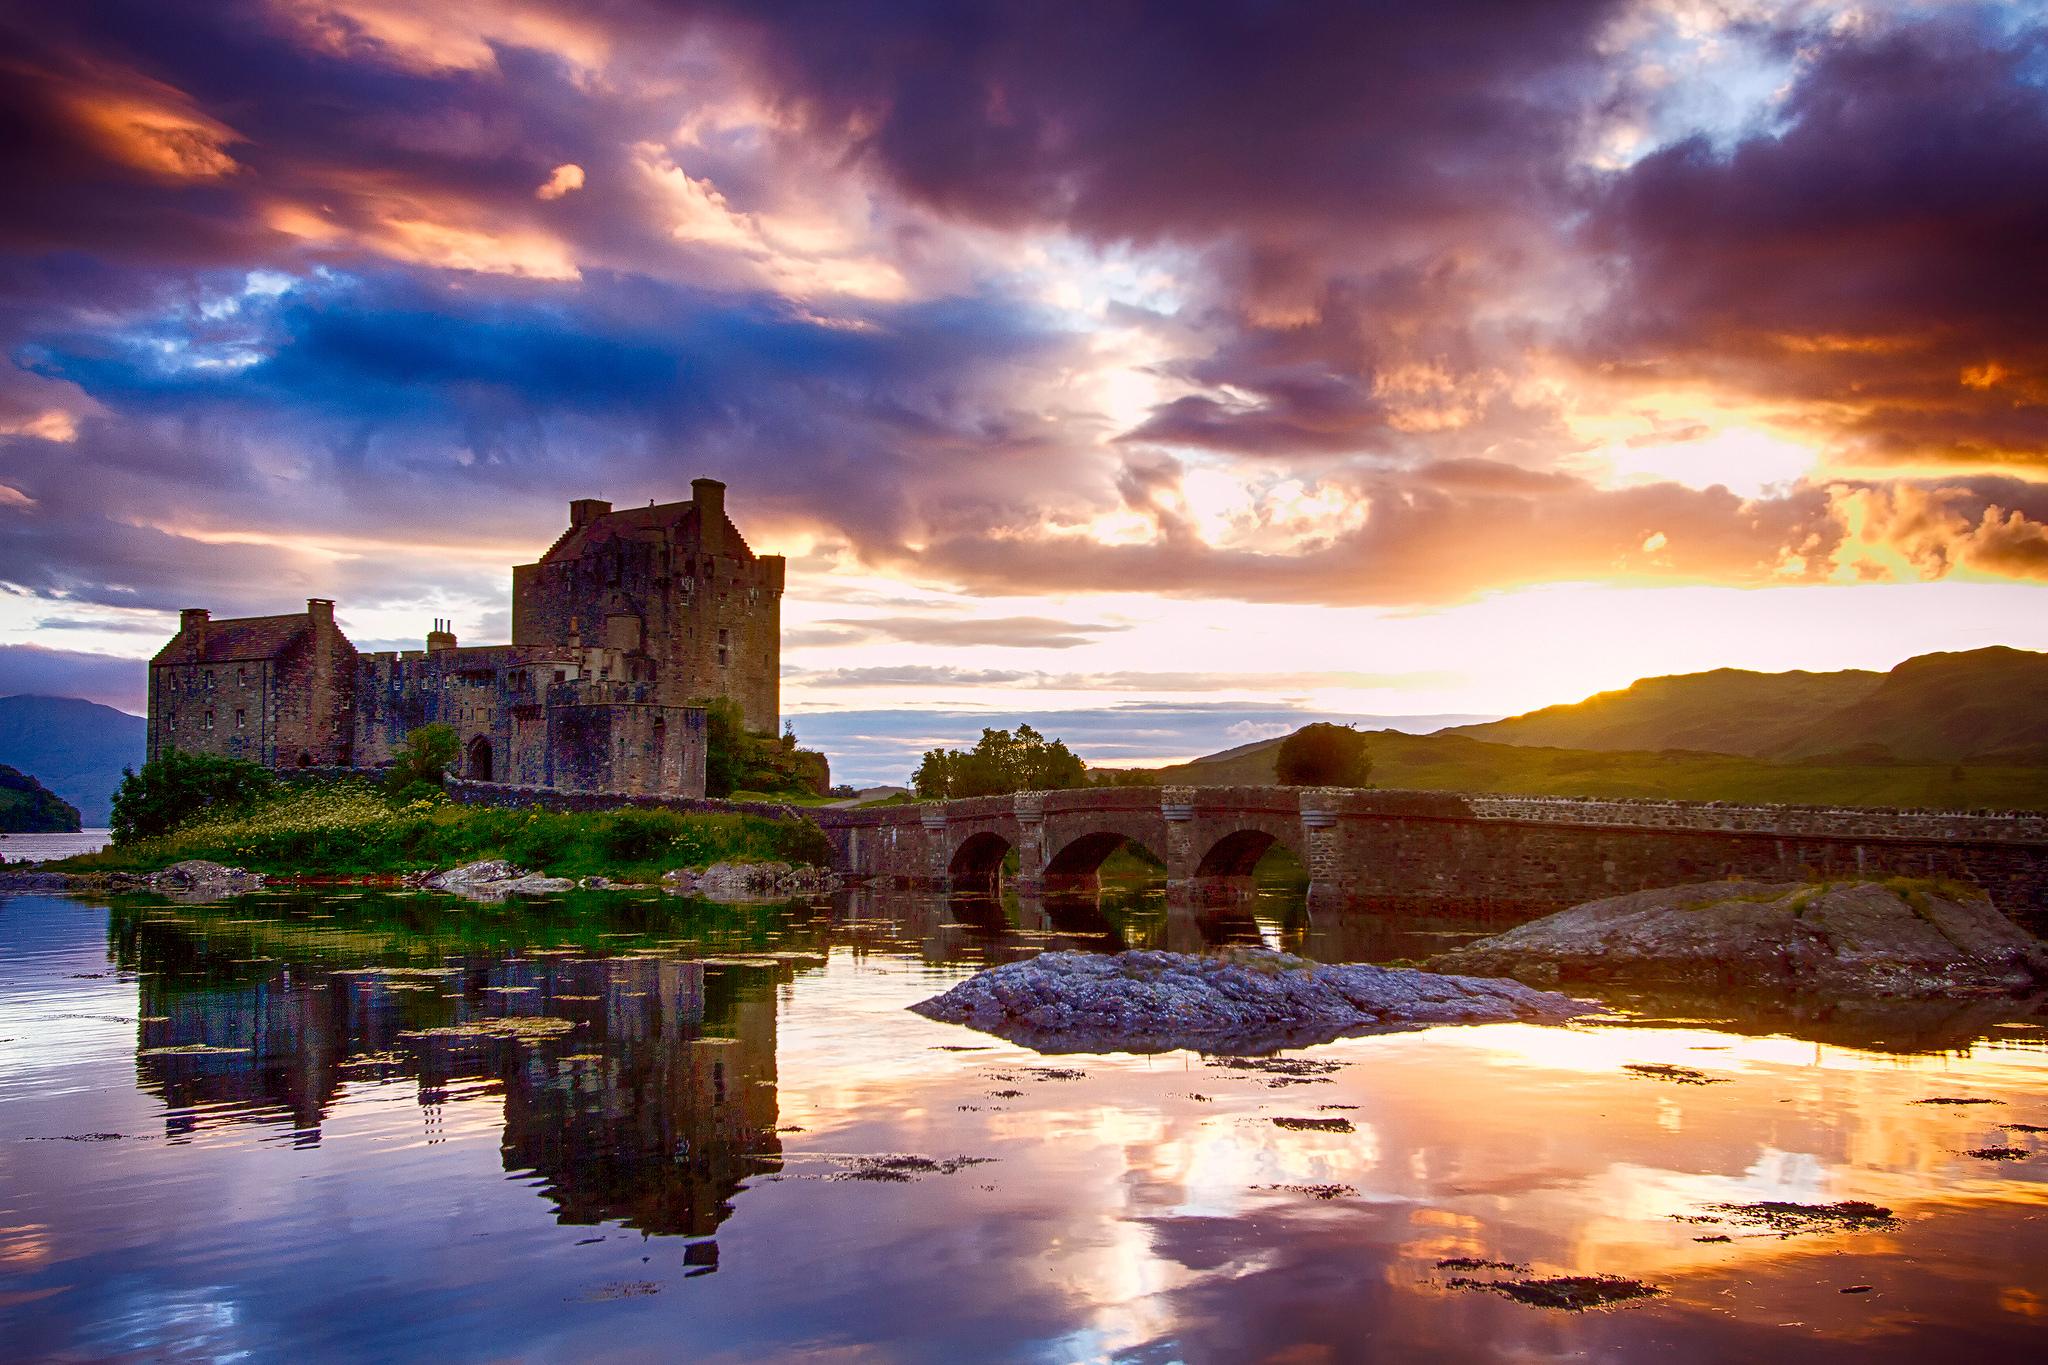 Eilean Donan Castle Scotland 2048x1365